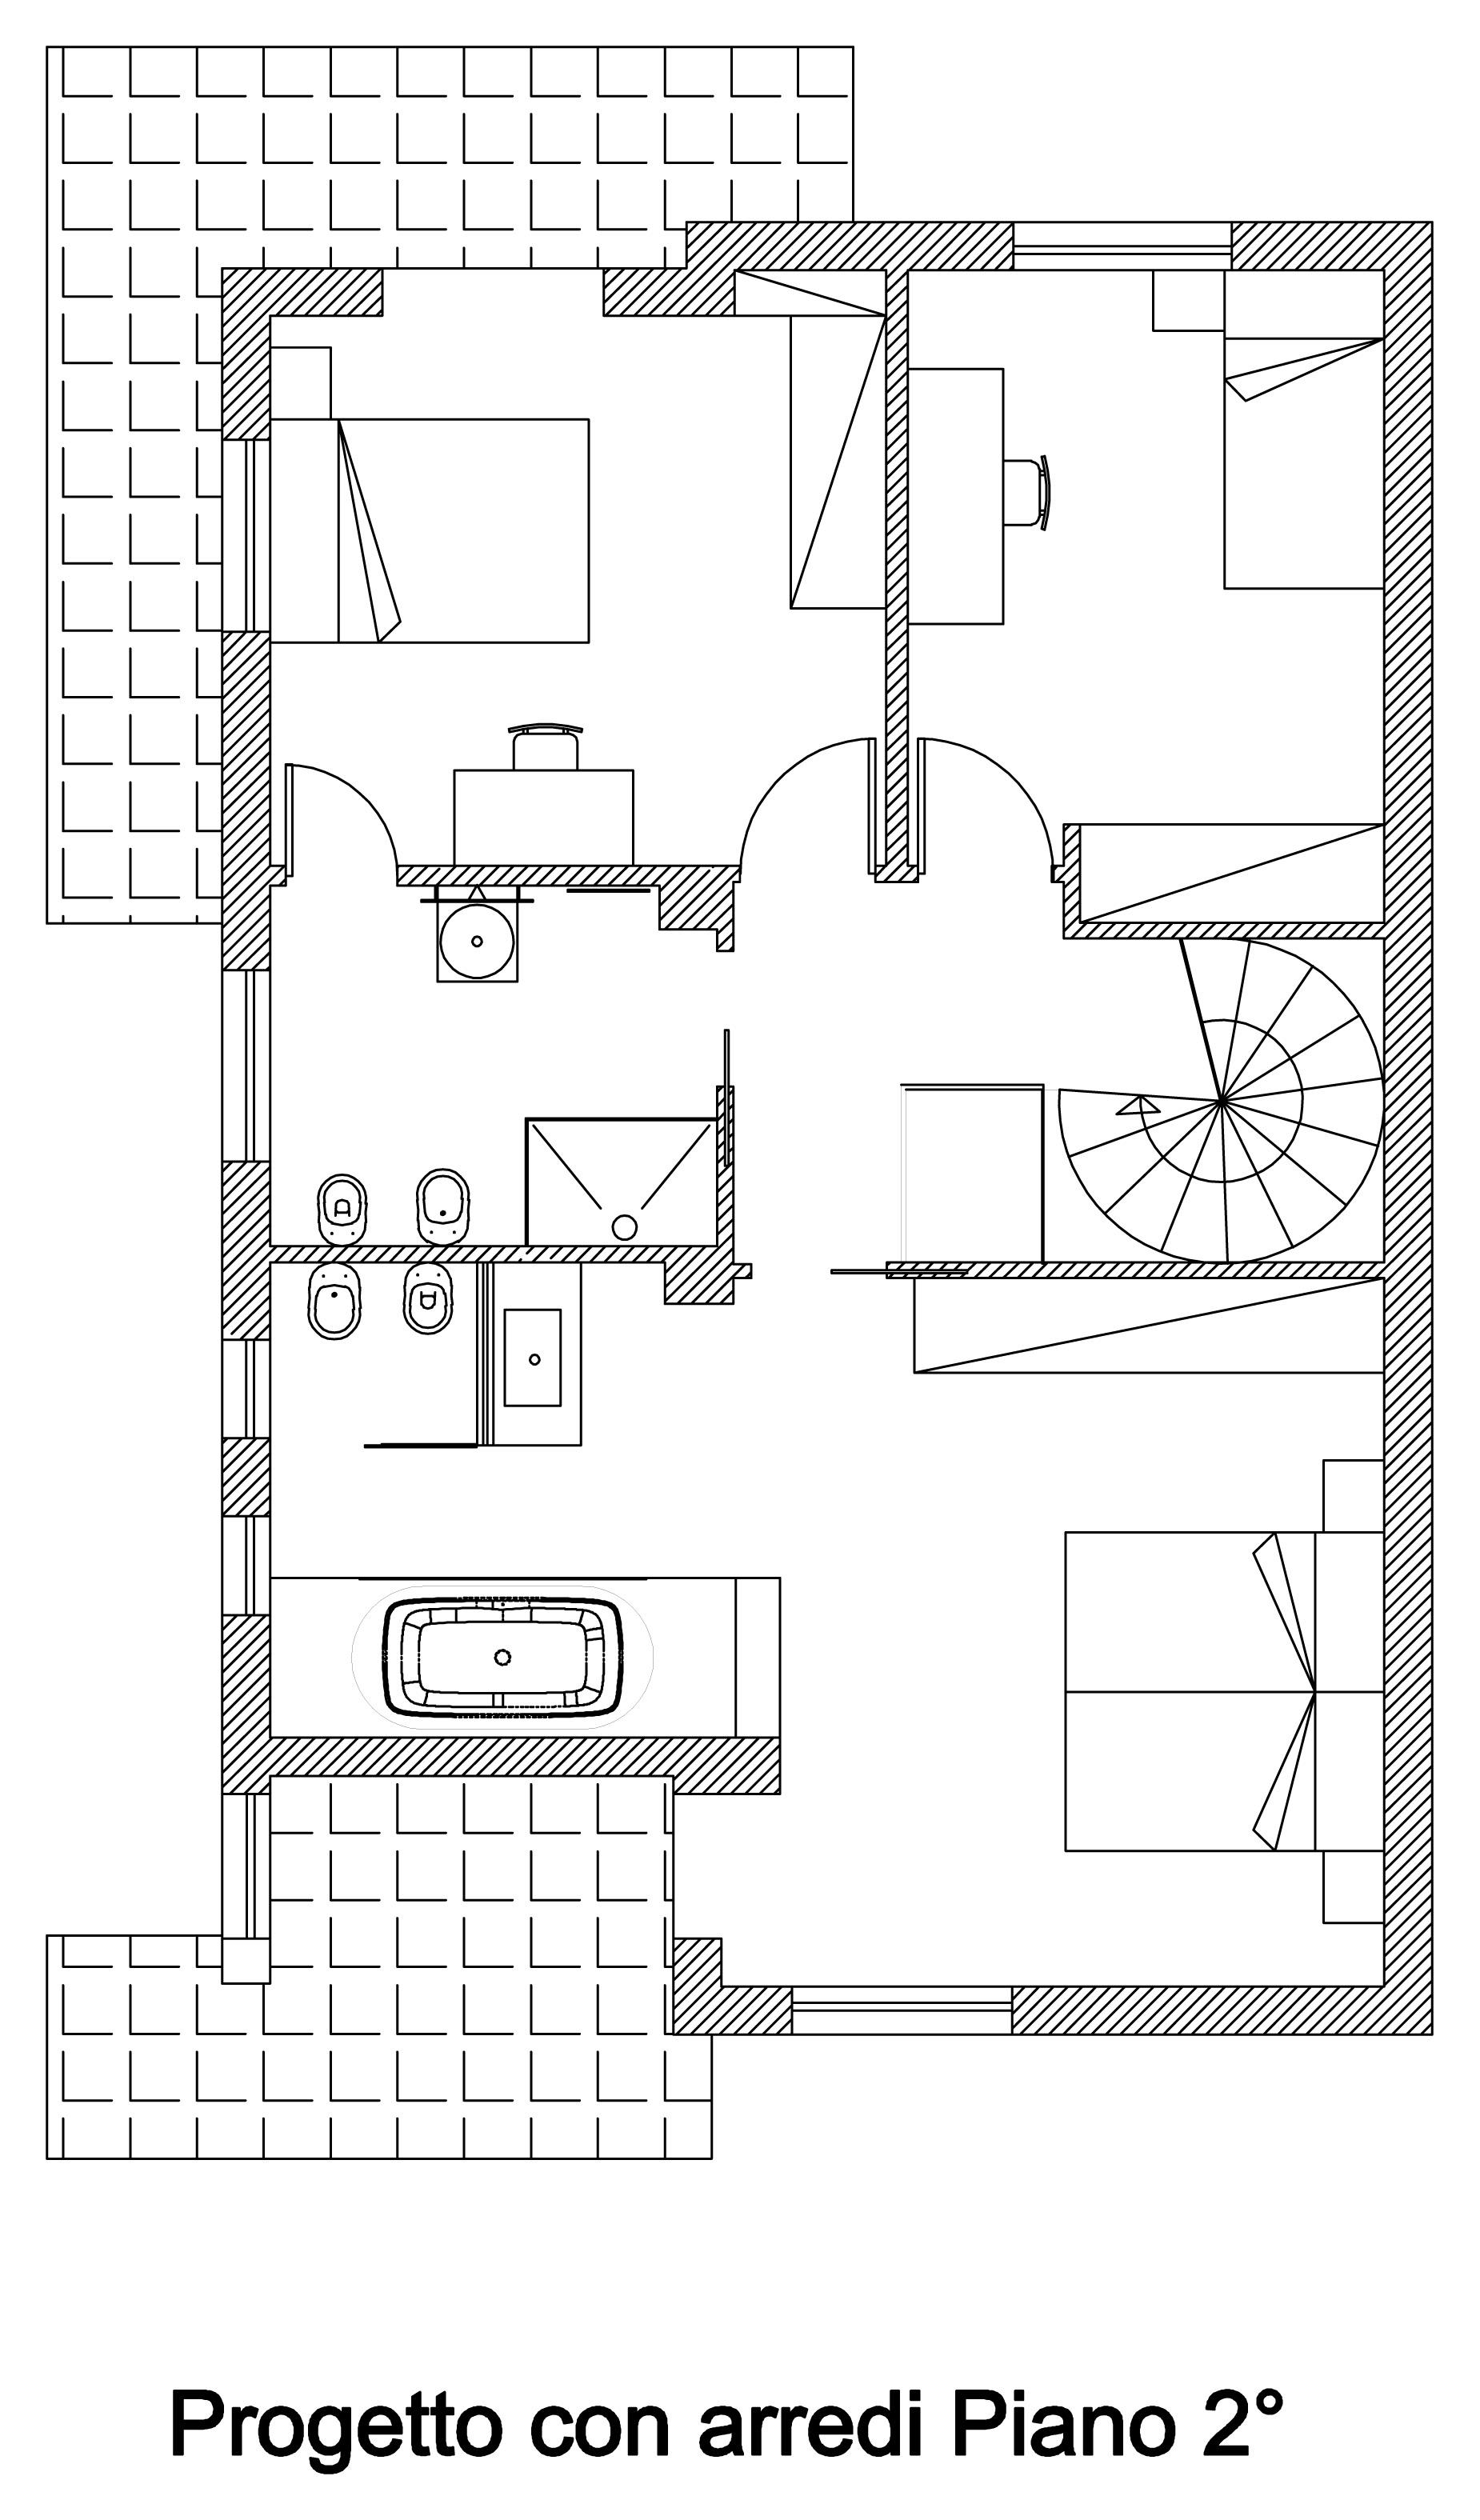 arco-arnone-interior-diseño-de-unabitazione-de-2-niveles del piso segundo